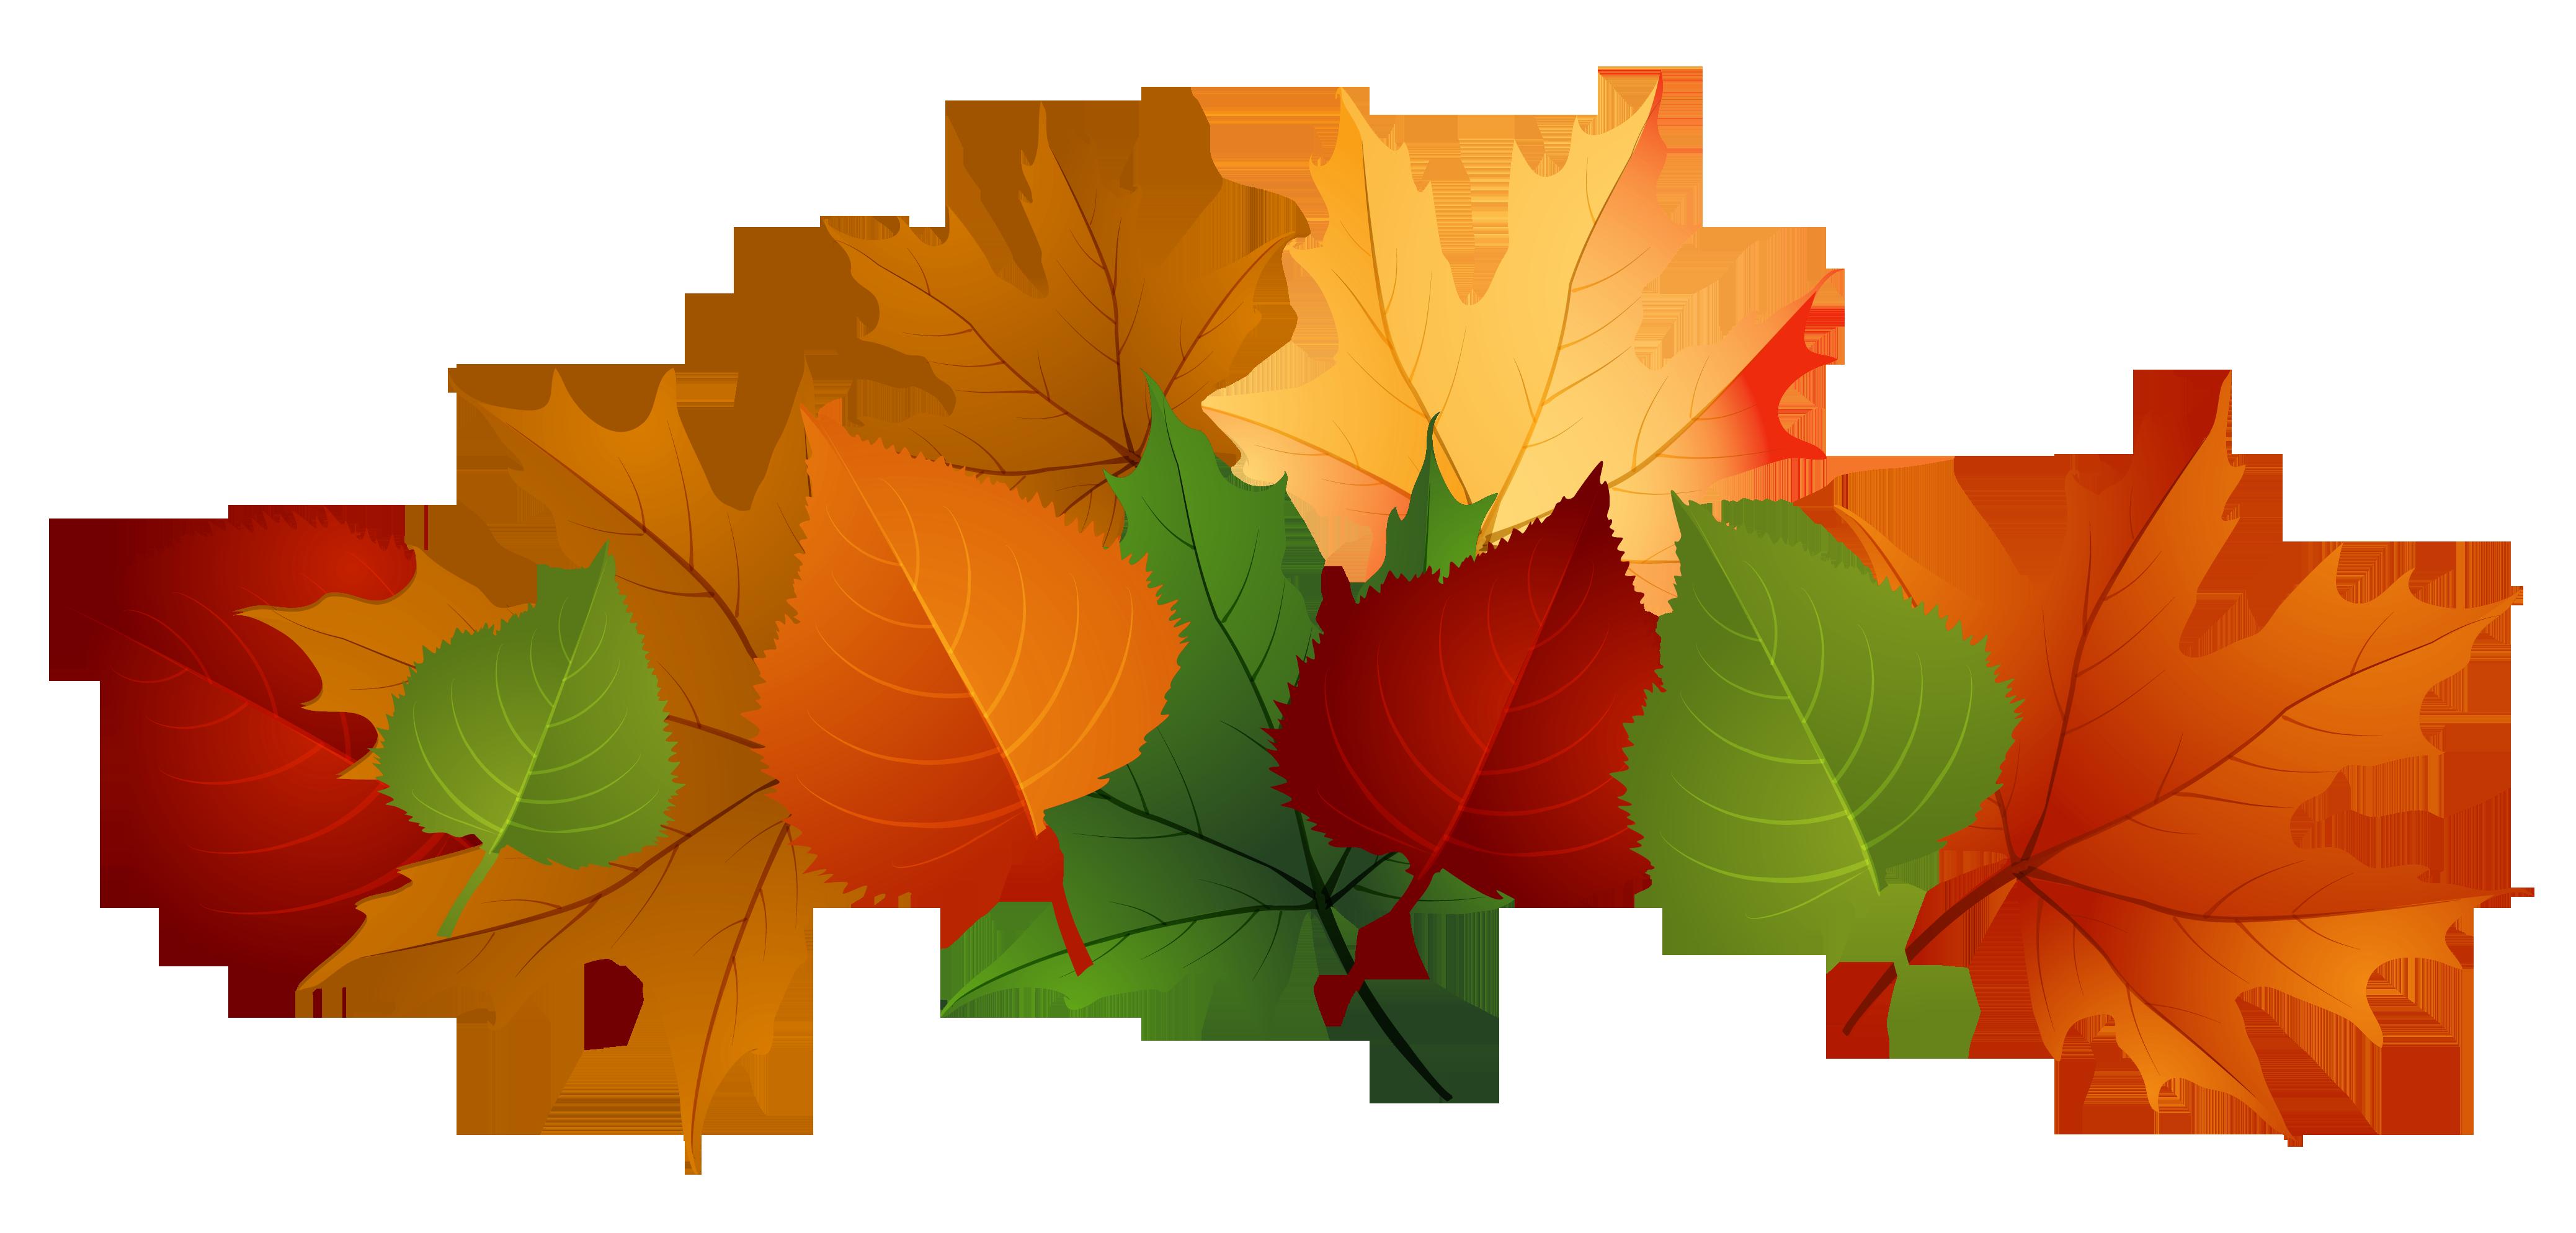 ... Clipart Autumn Leaves - clipartall .-... Clipart Autumn Leaves - clipartall ...-7